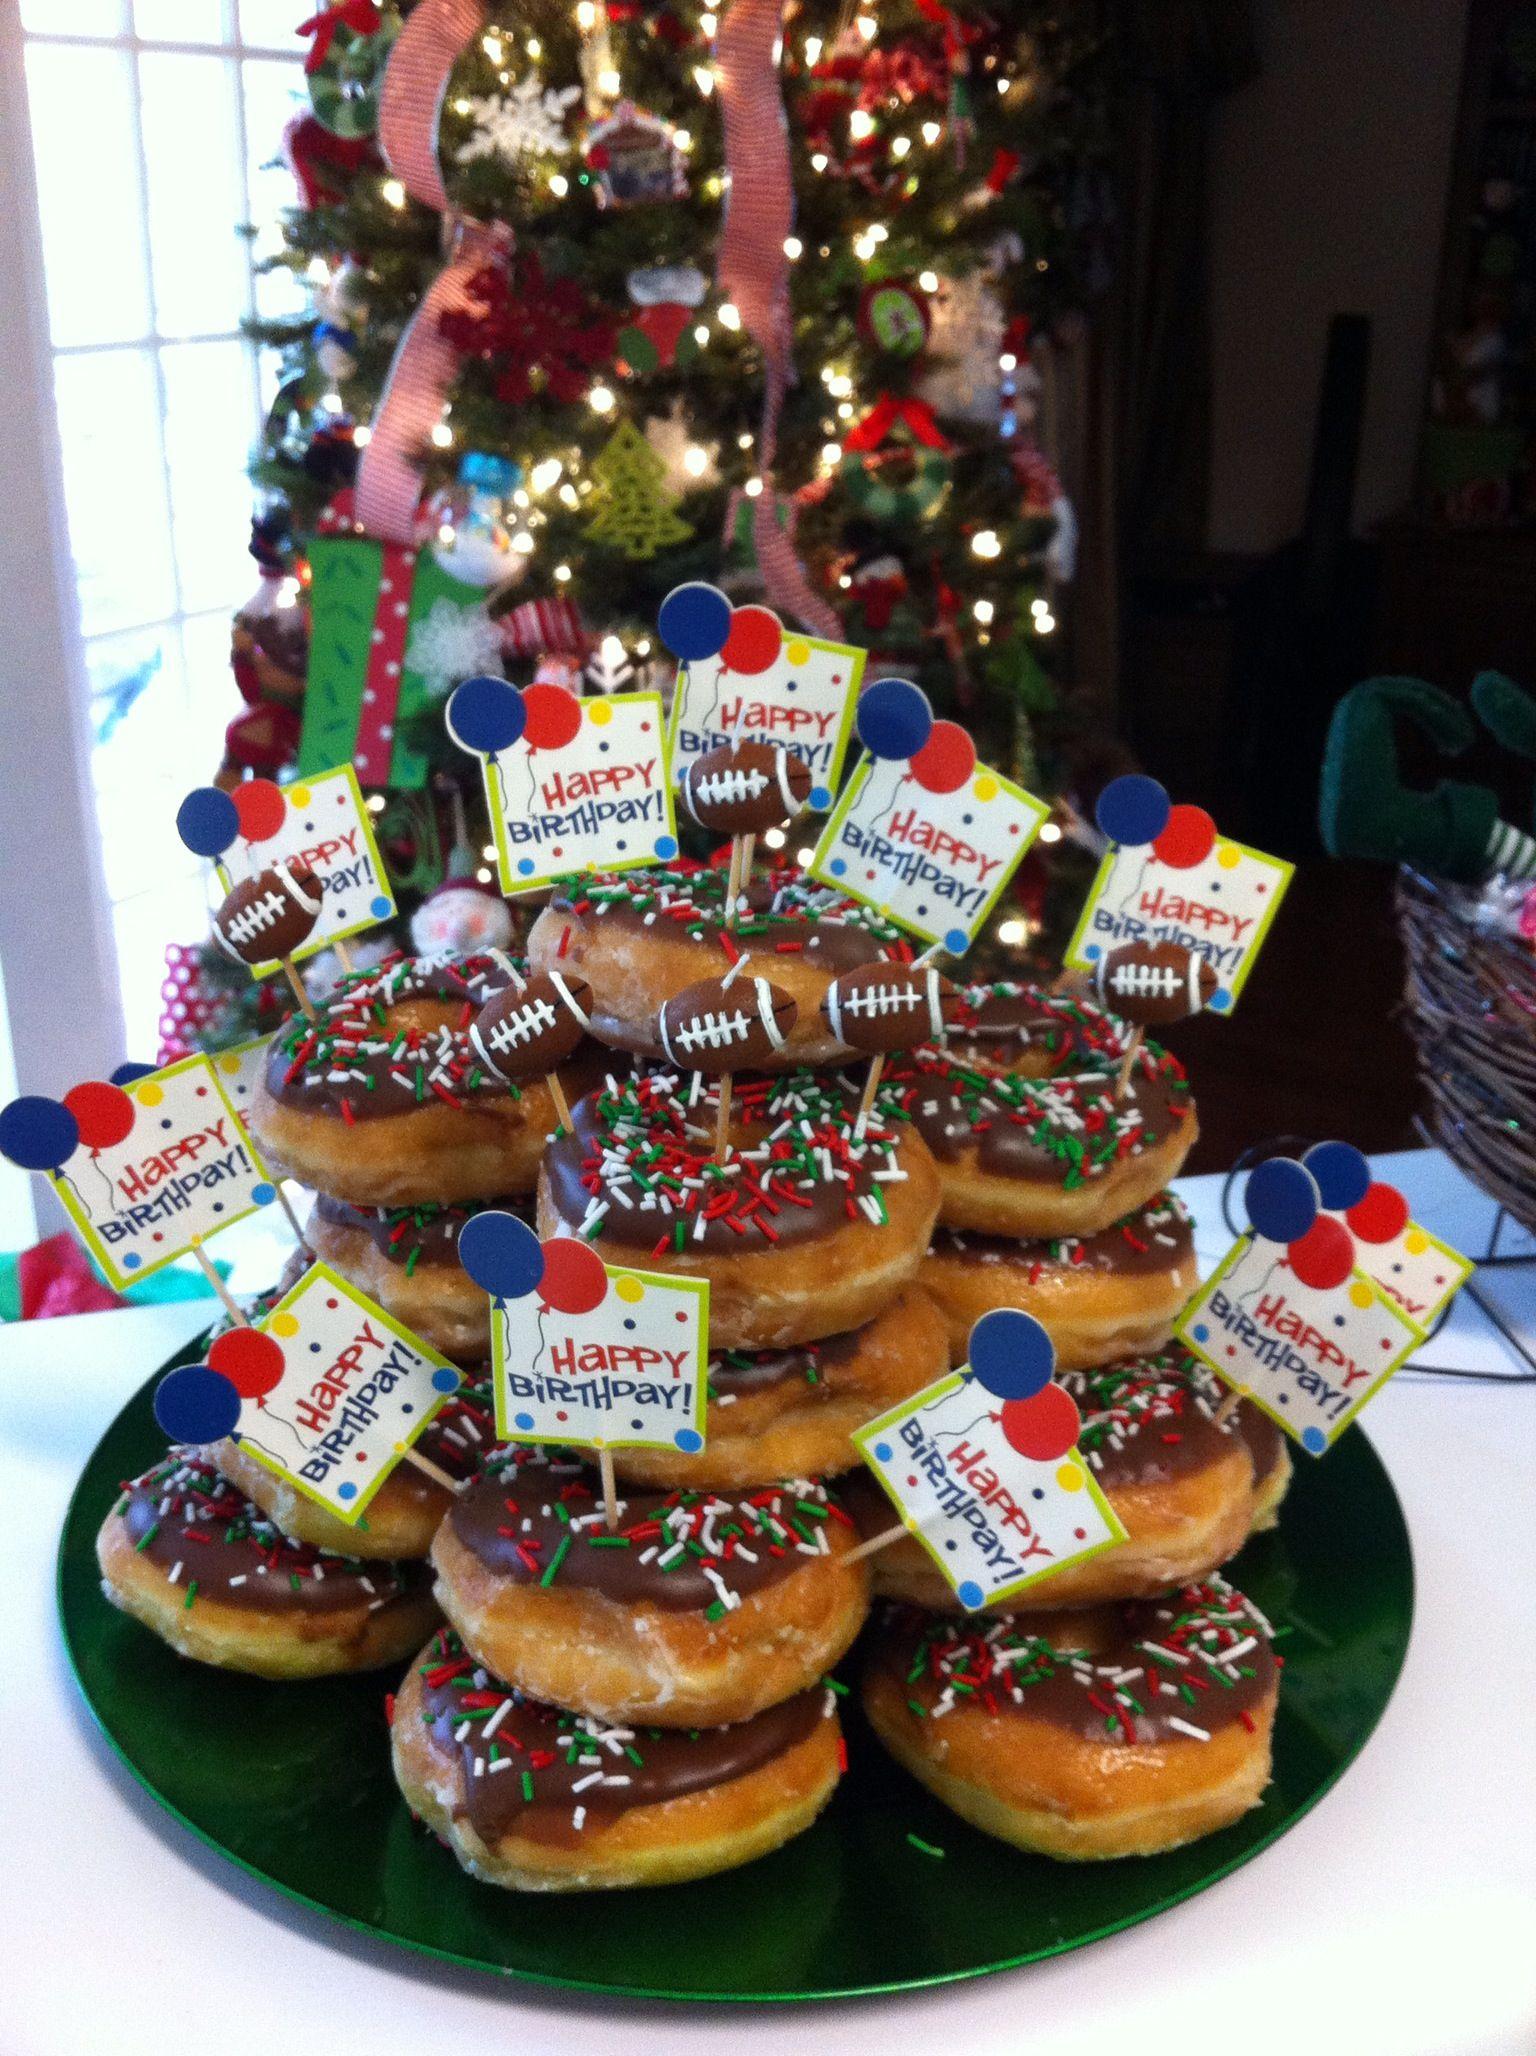 Doughnut birthday cake made using 2 dozen krispy kreme